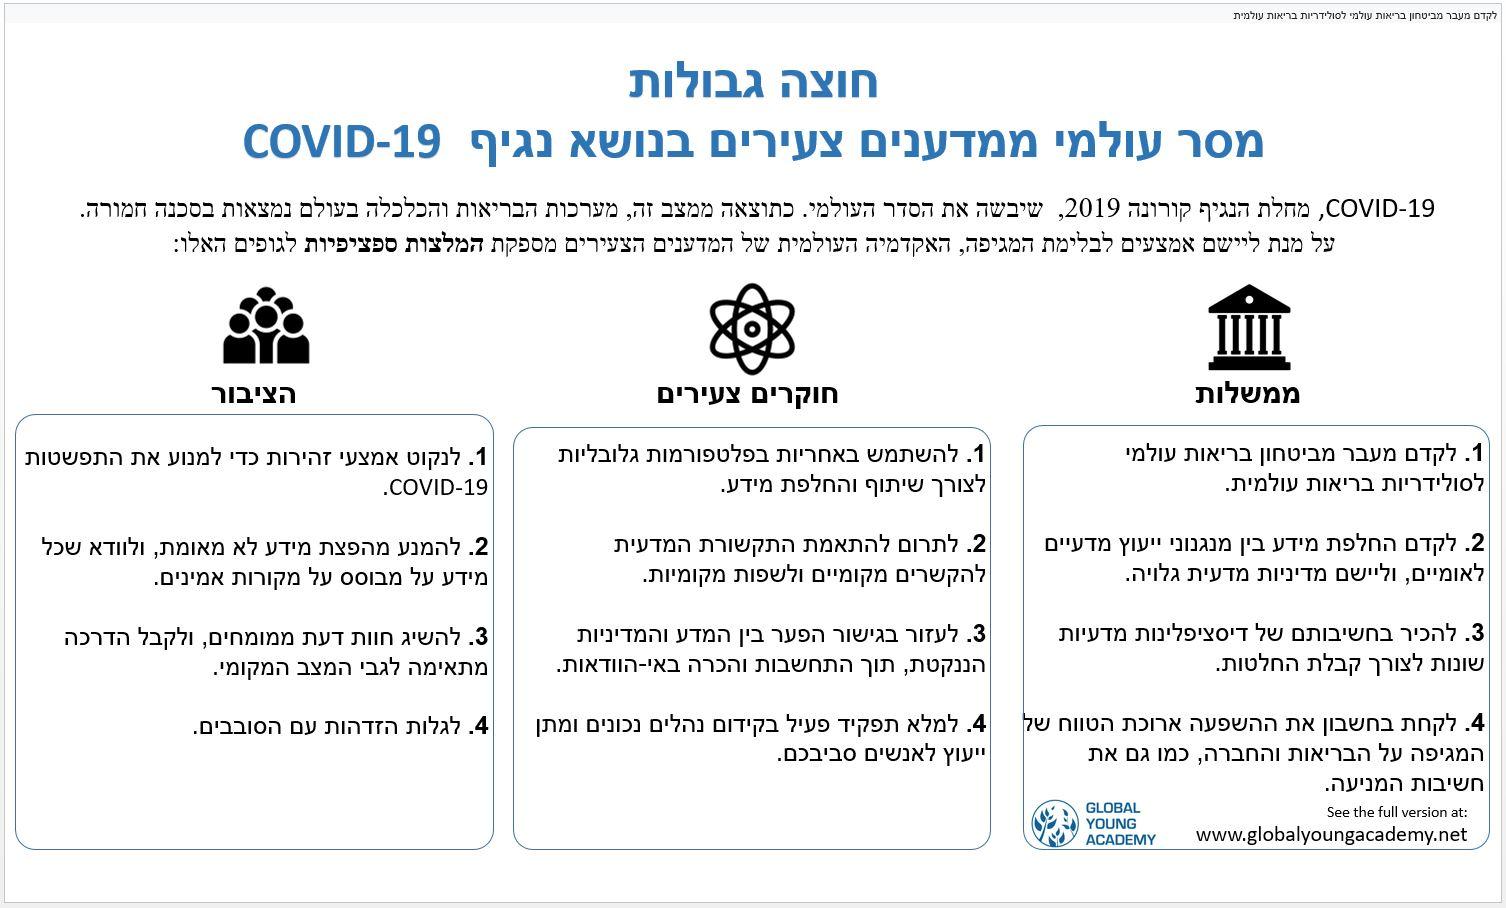 GYA COVID-19 statement infographic - Hebrew version